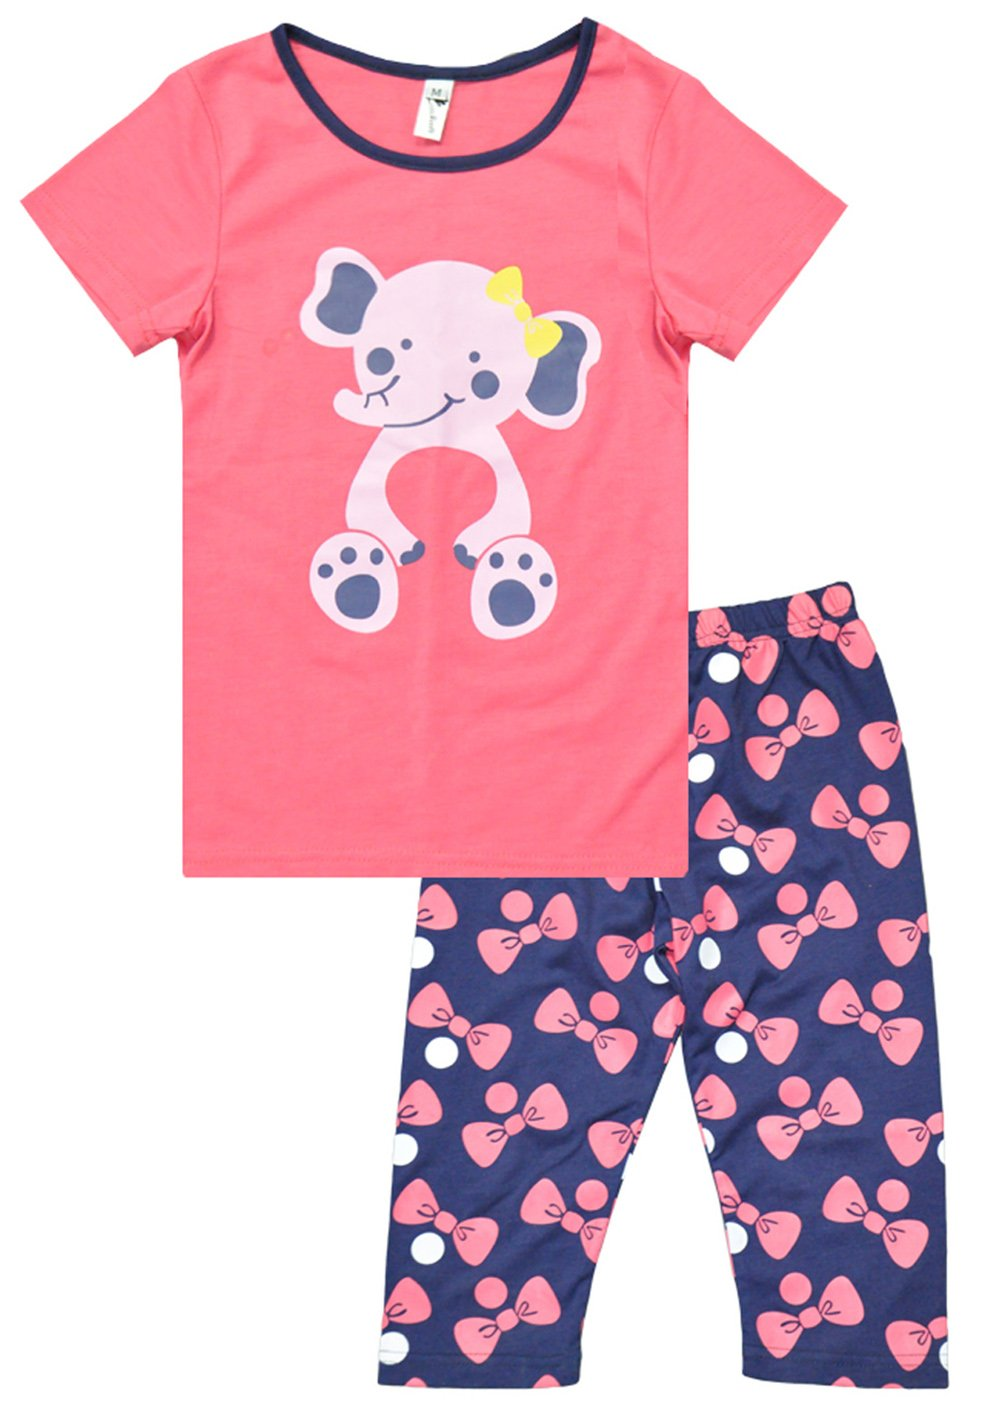 Fedpop Little Girls Spring Pyjama Sets Elephant Printed Short Sleeve Sleepwear For 2-7T